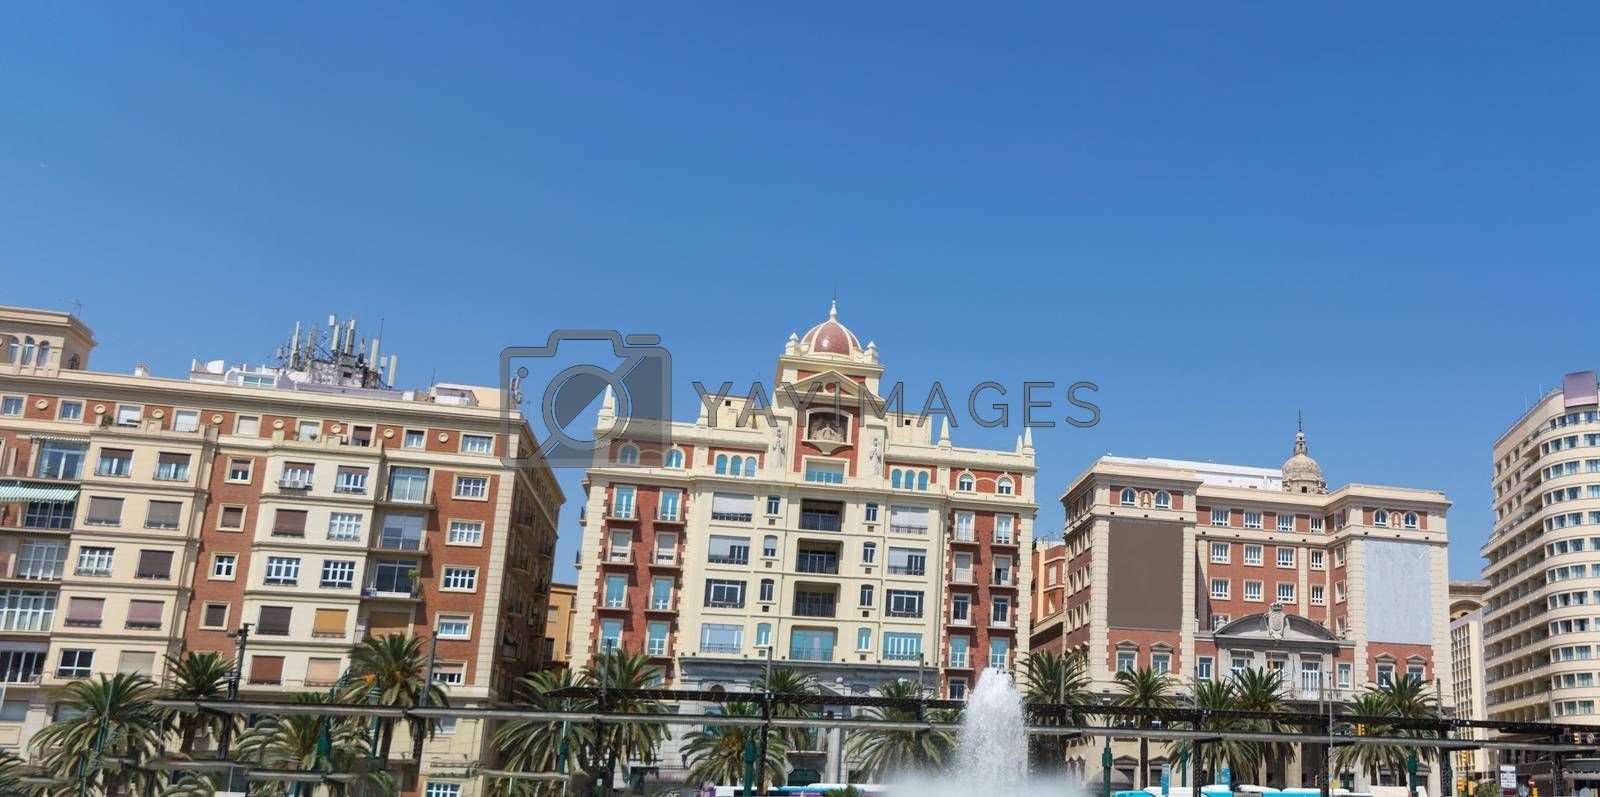 Royalty free image of Super Panoramablick auf der Plaza De La Marina (Marina Square) in der Altstadt.                        Super panoramic view of the Plaza De La Marina (Marina Square) in the old town.        by JFsPic